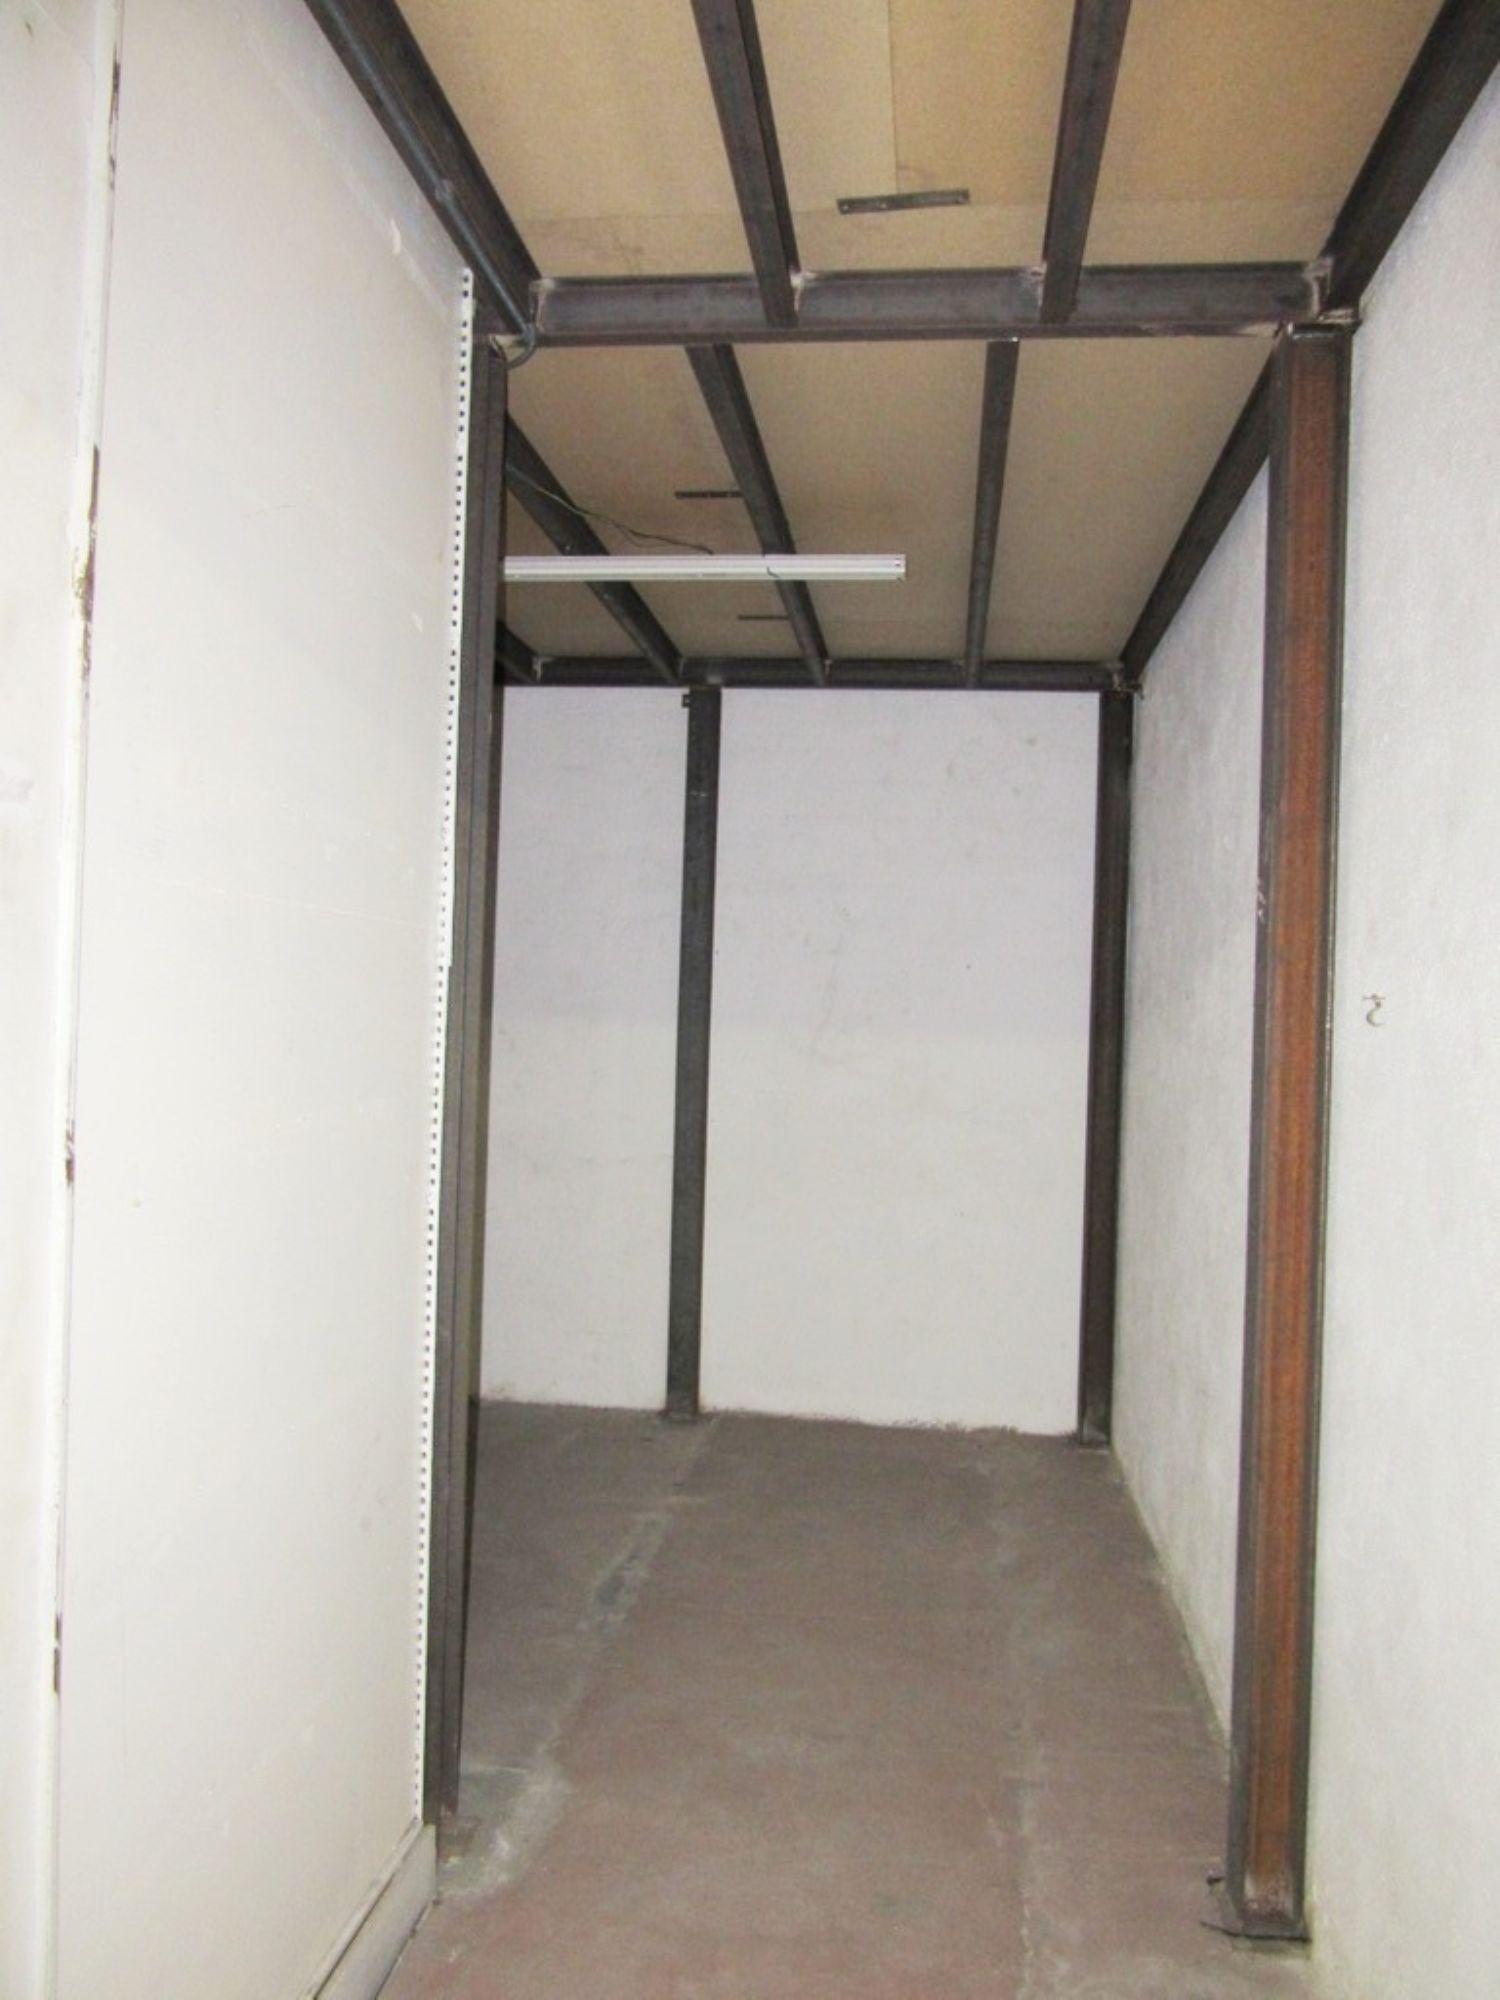 Local comercial en alquiler en Rubí - 359241955